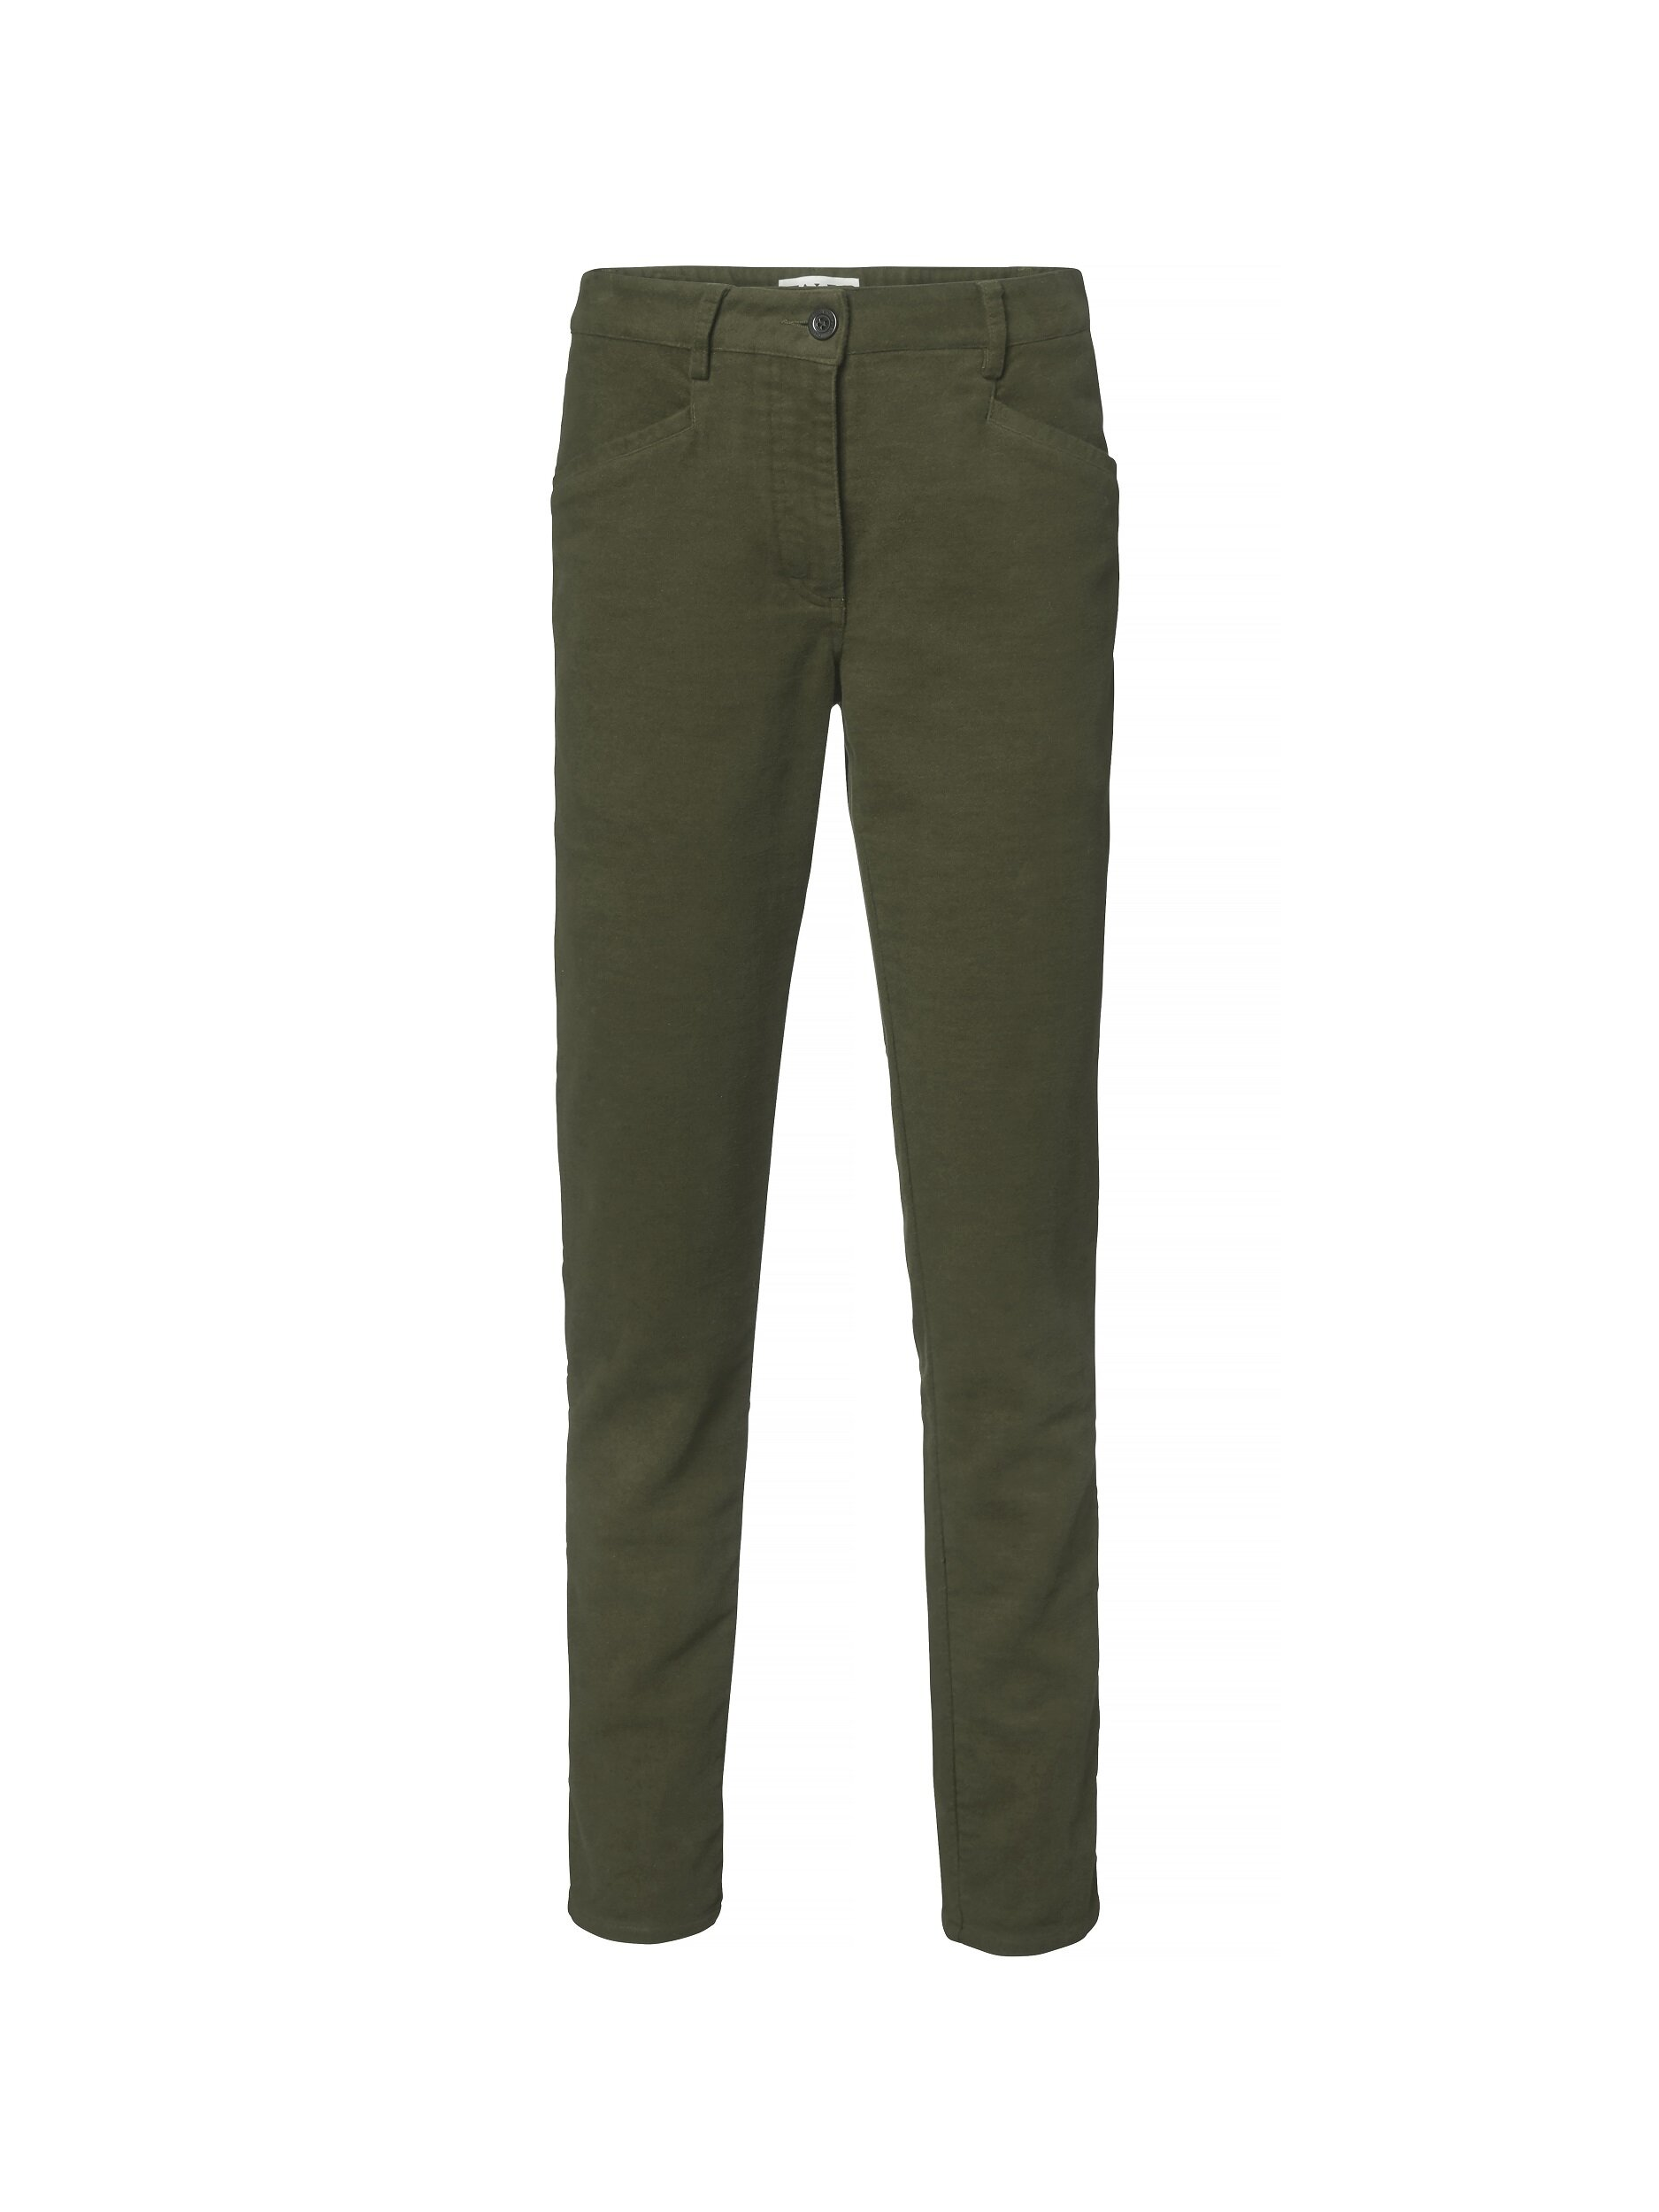 Tirley Pants Women